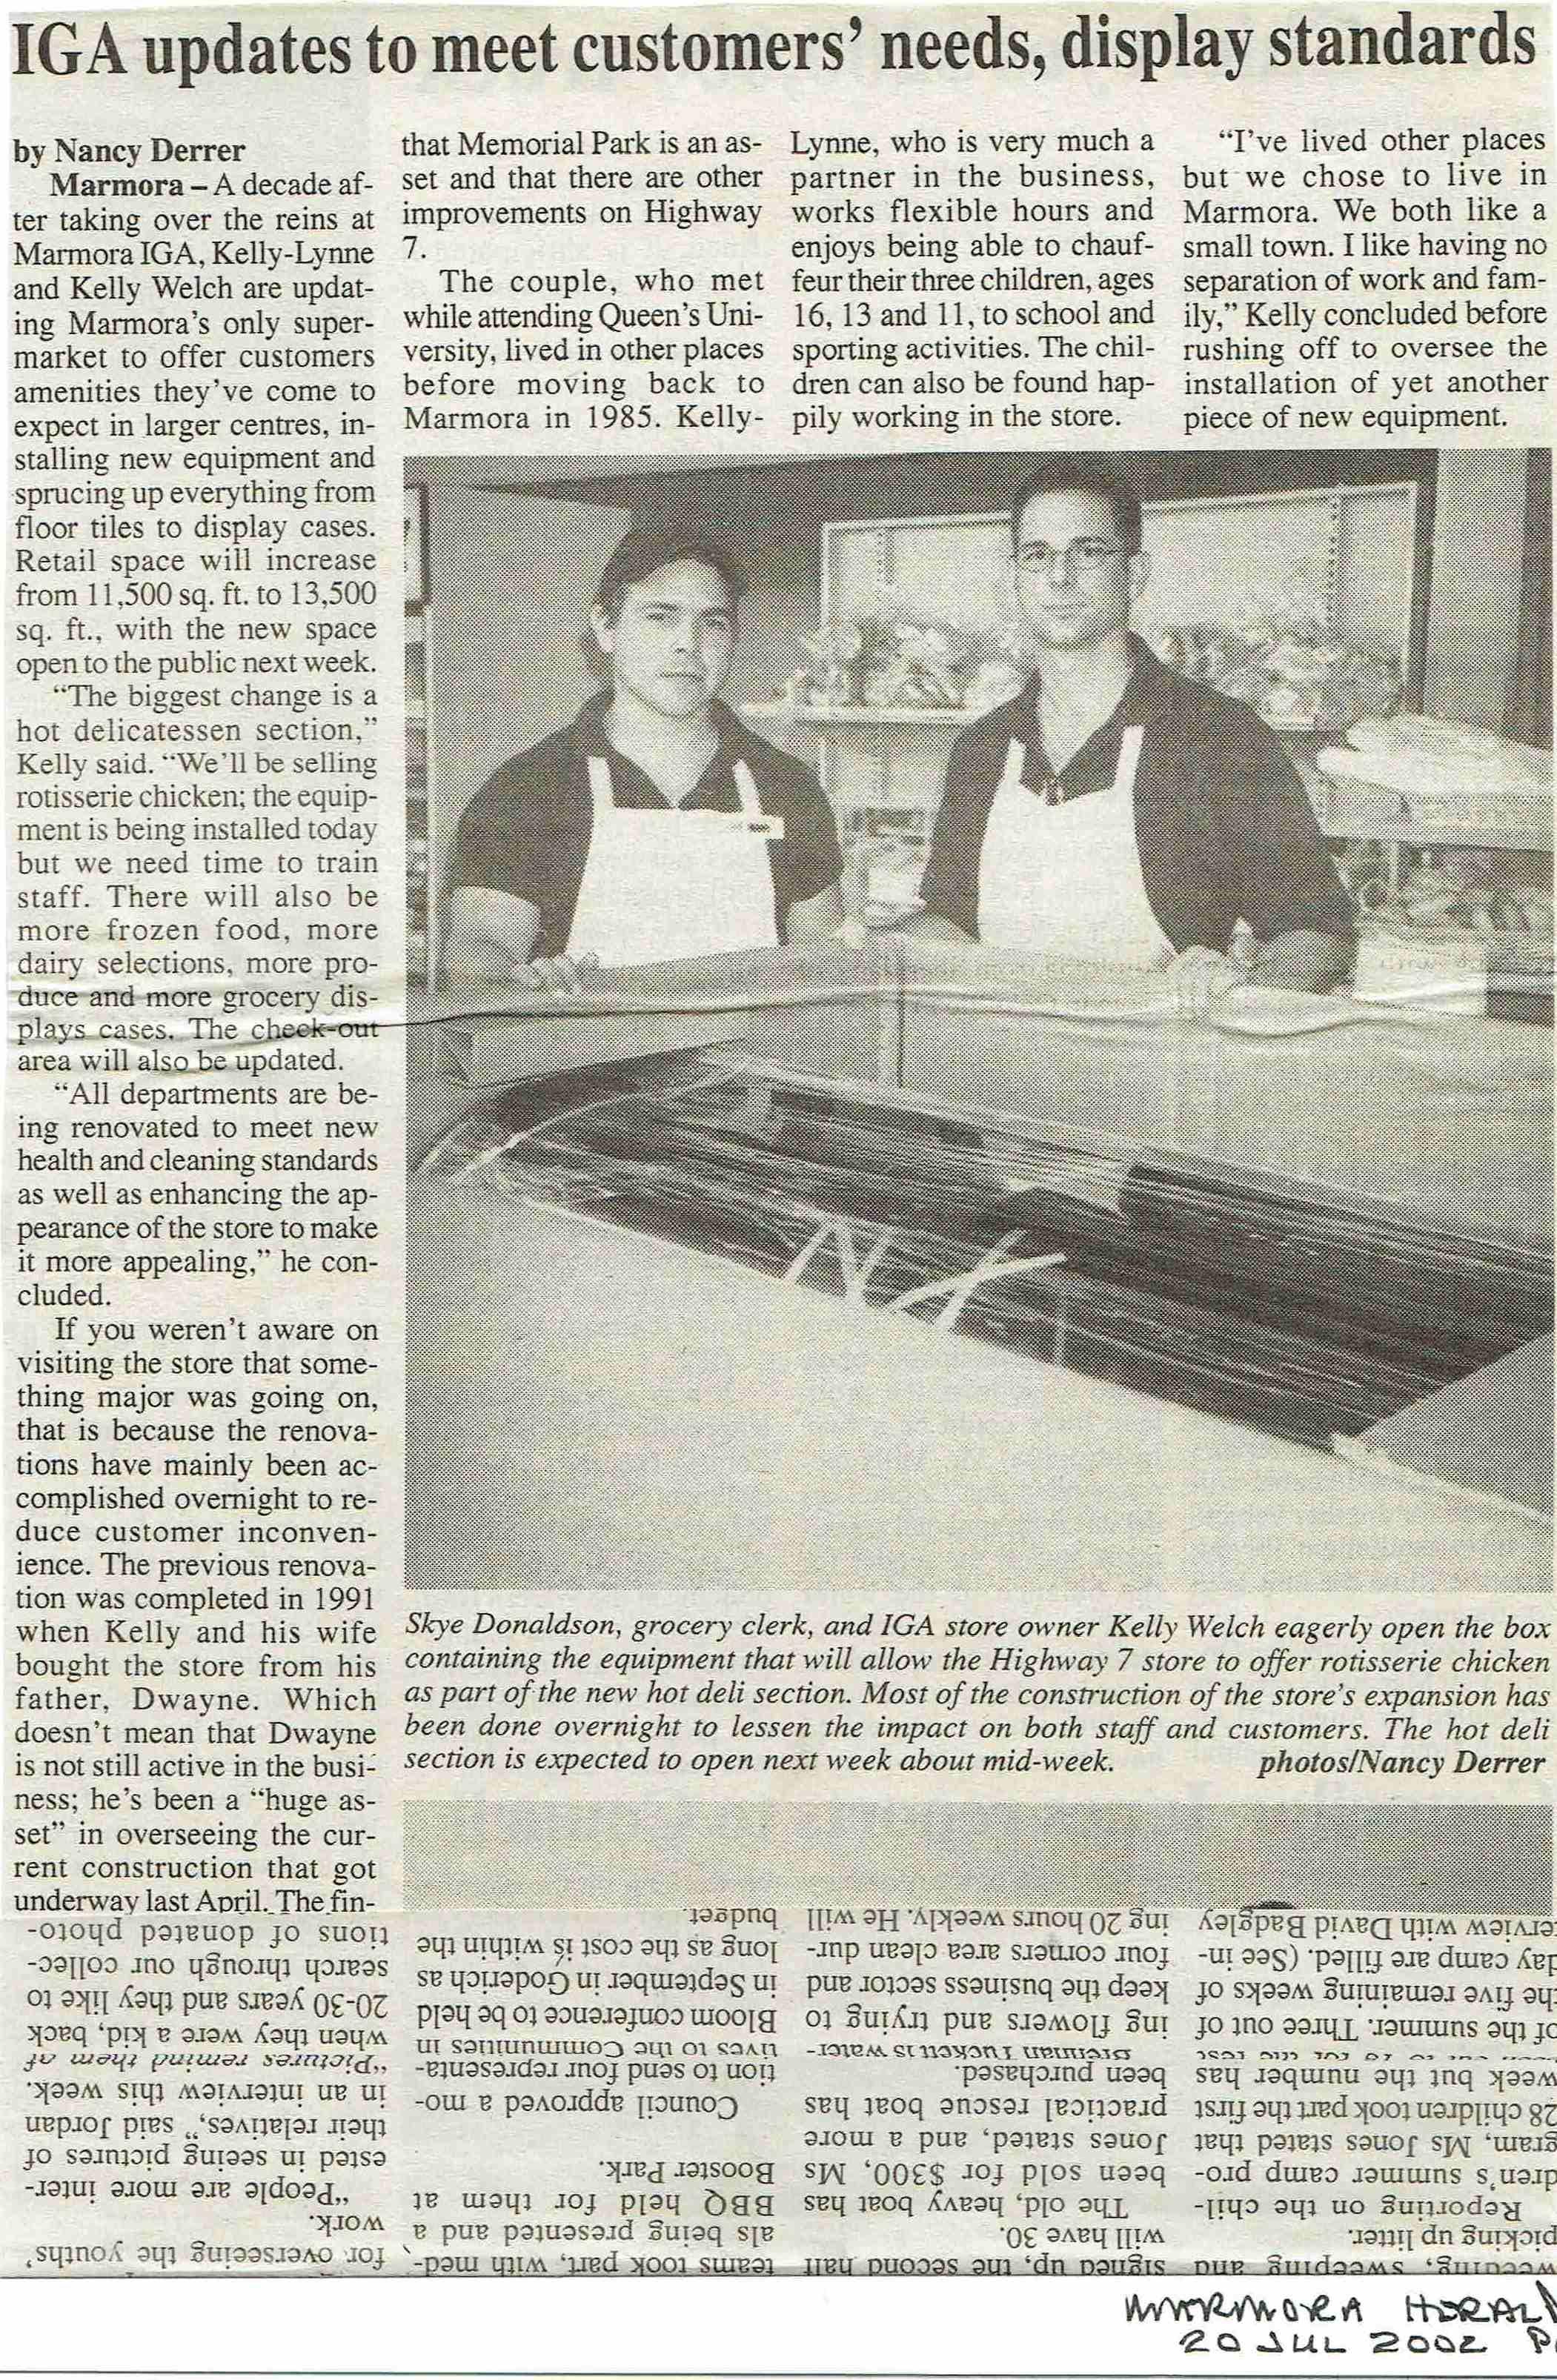 2002 IGA Kelly Welch updates .JPG